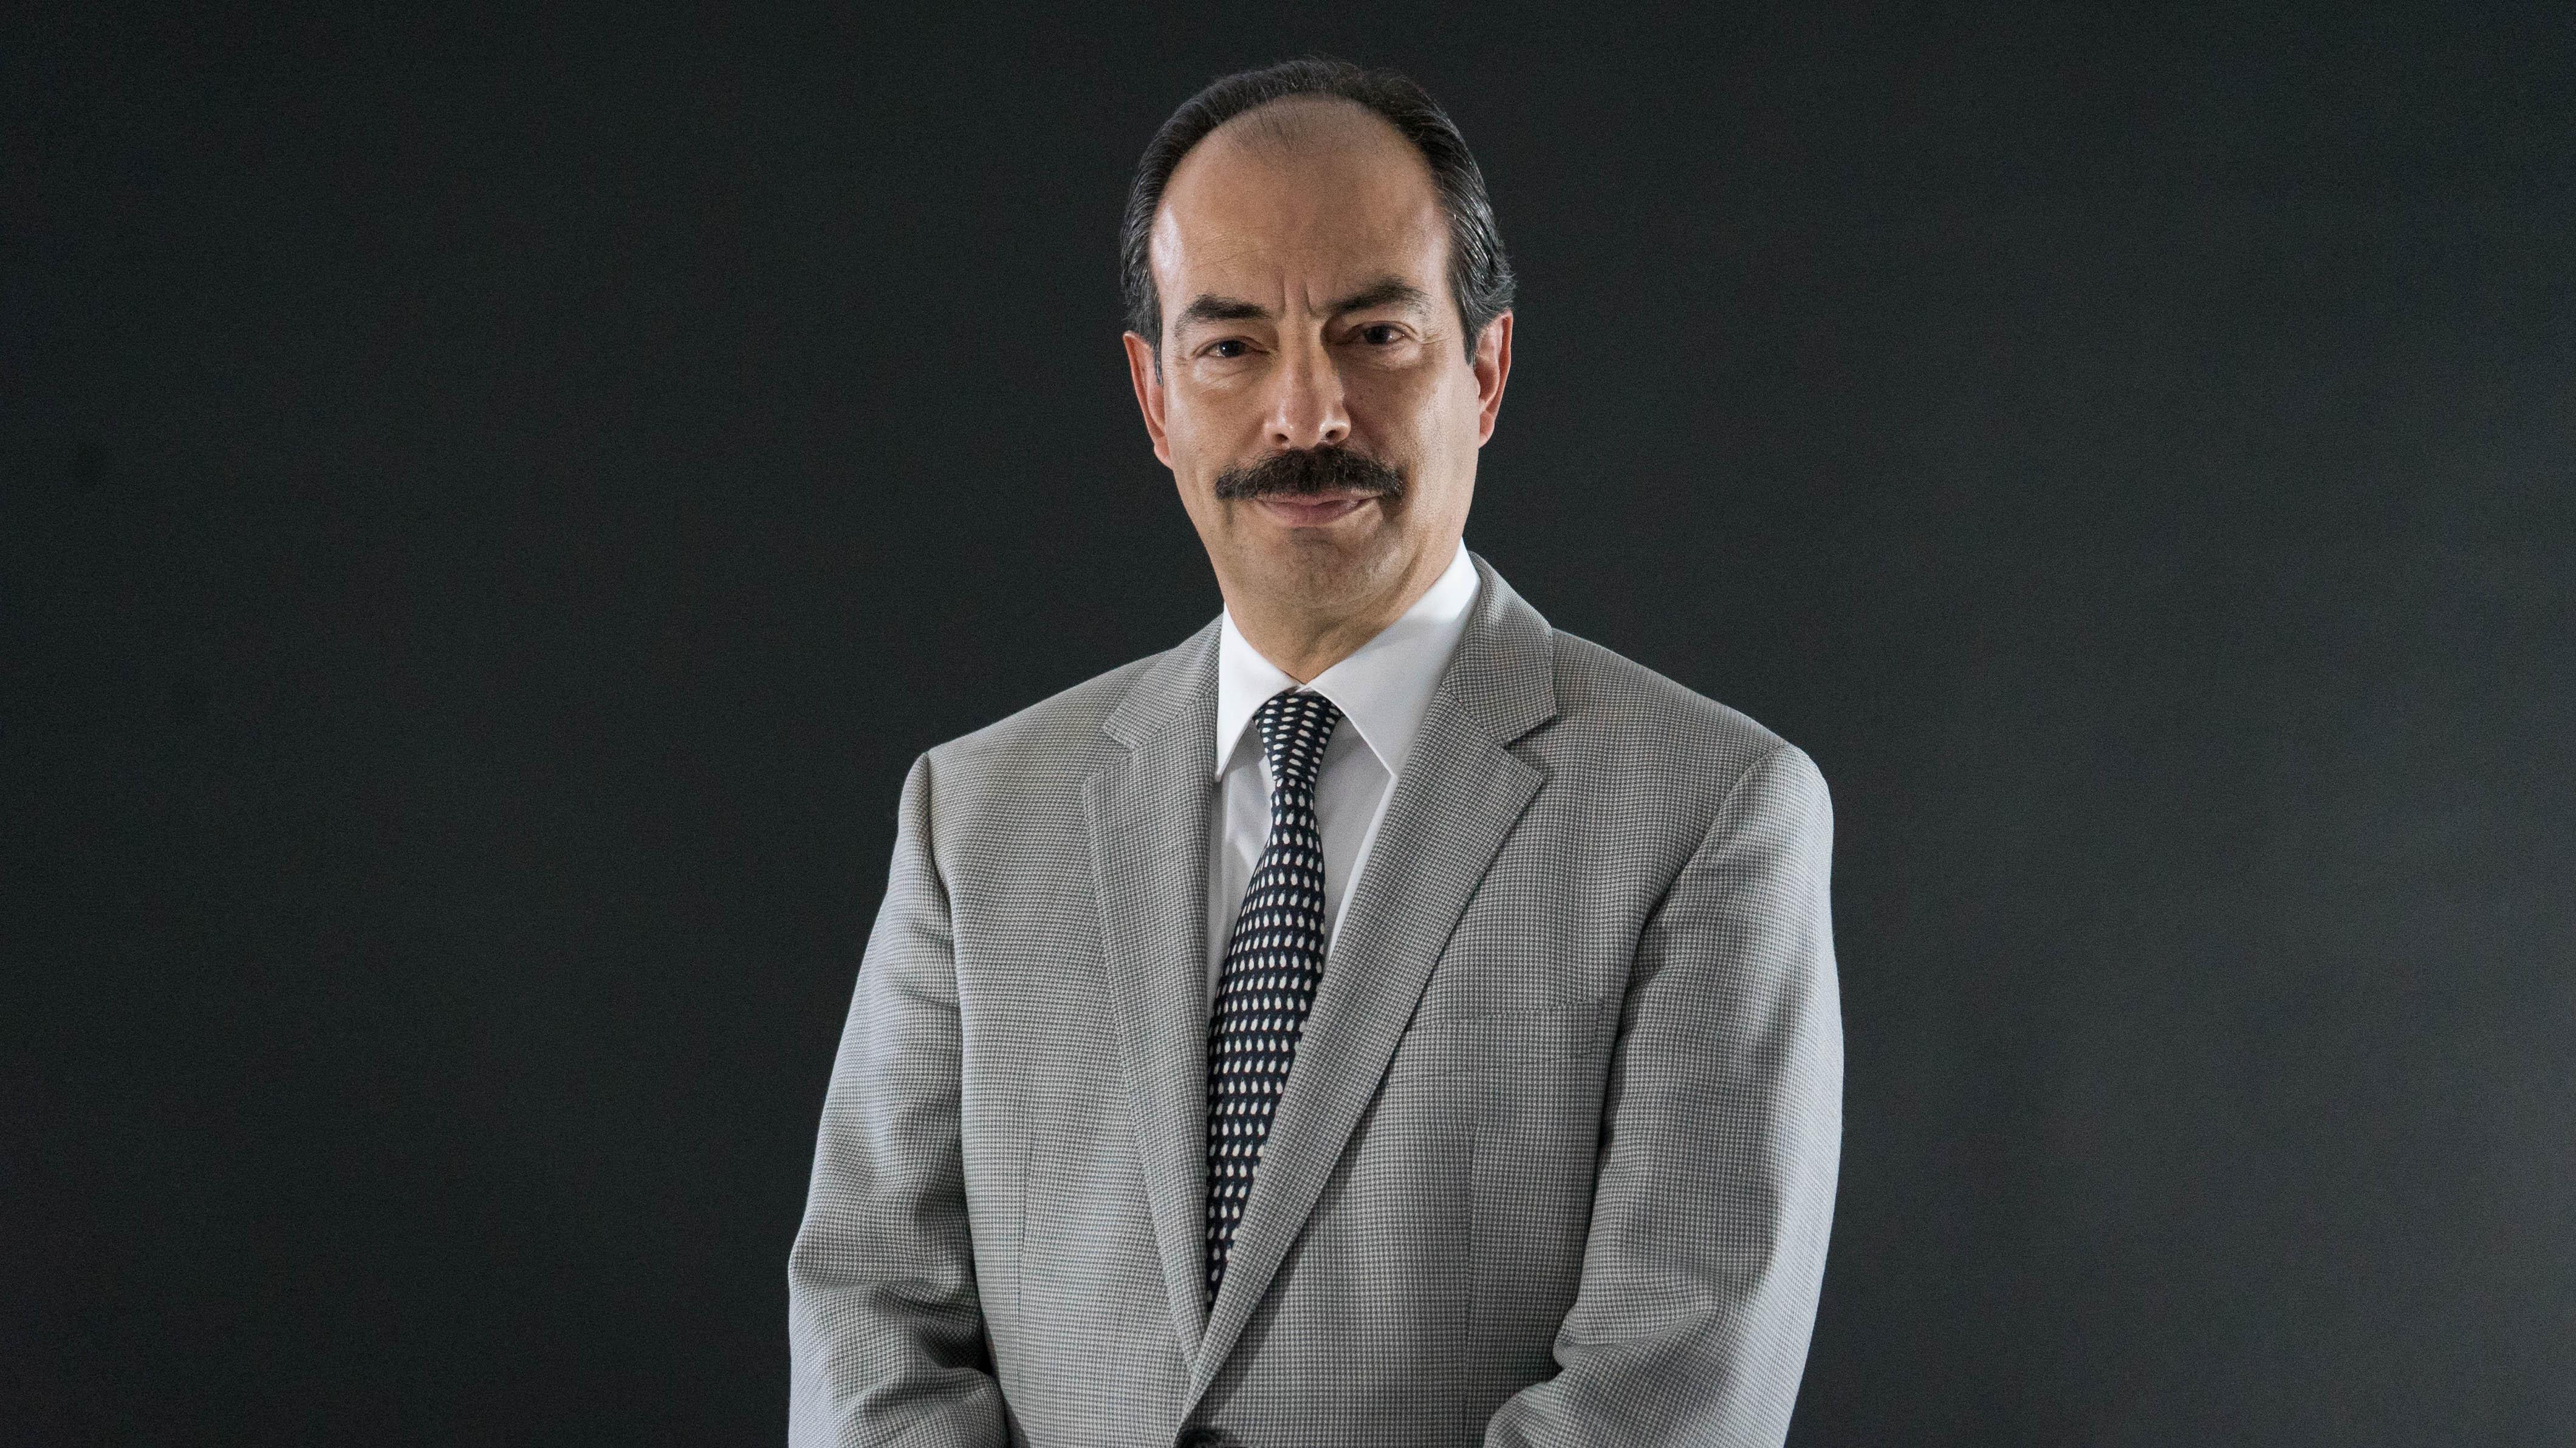 Héctor Flores Santana